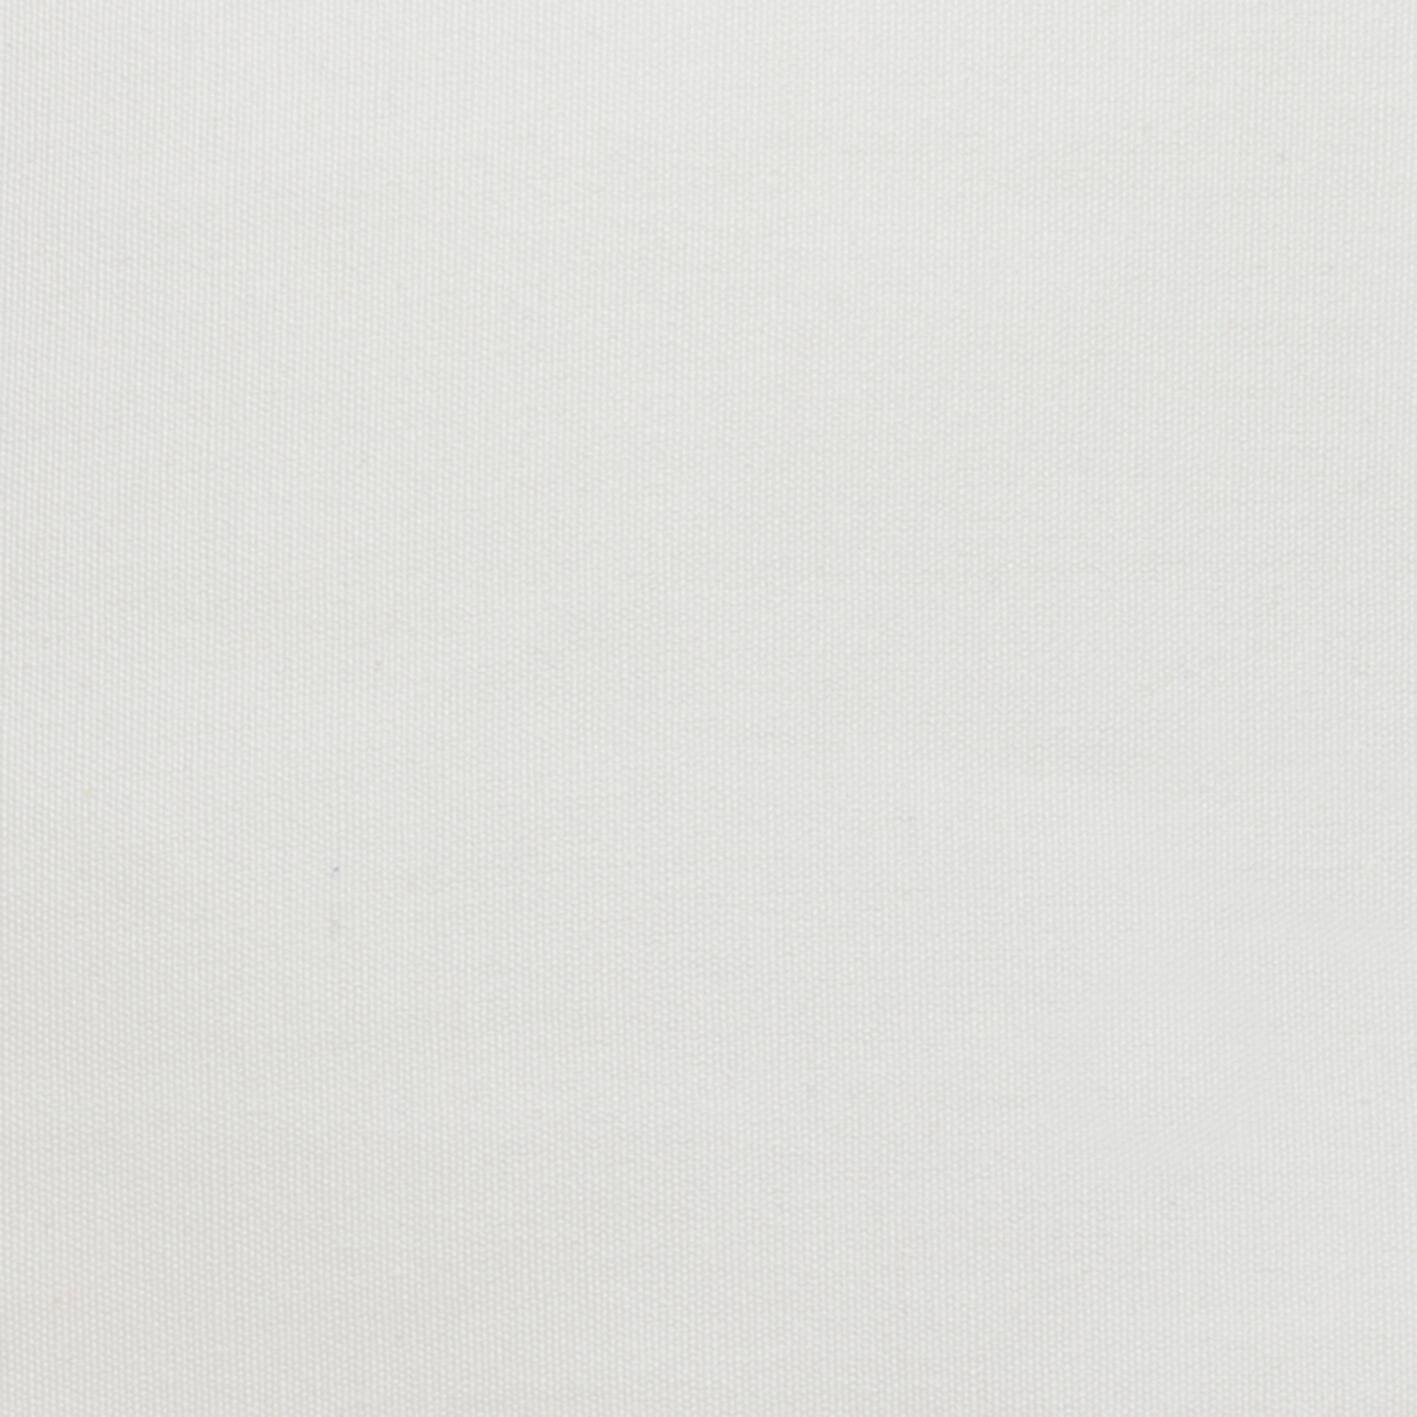 Cuscino INSPIRE Lea bianco 40x40 cm - 2